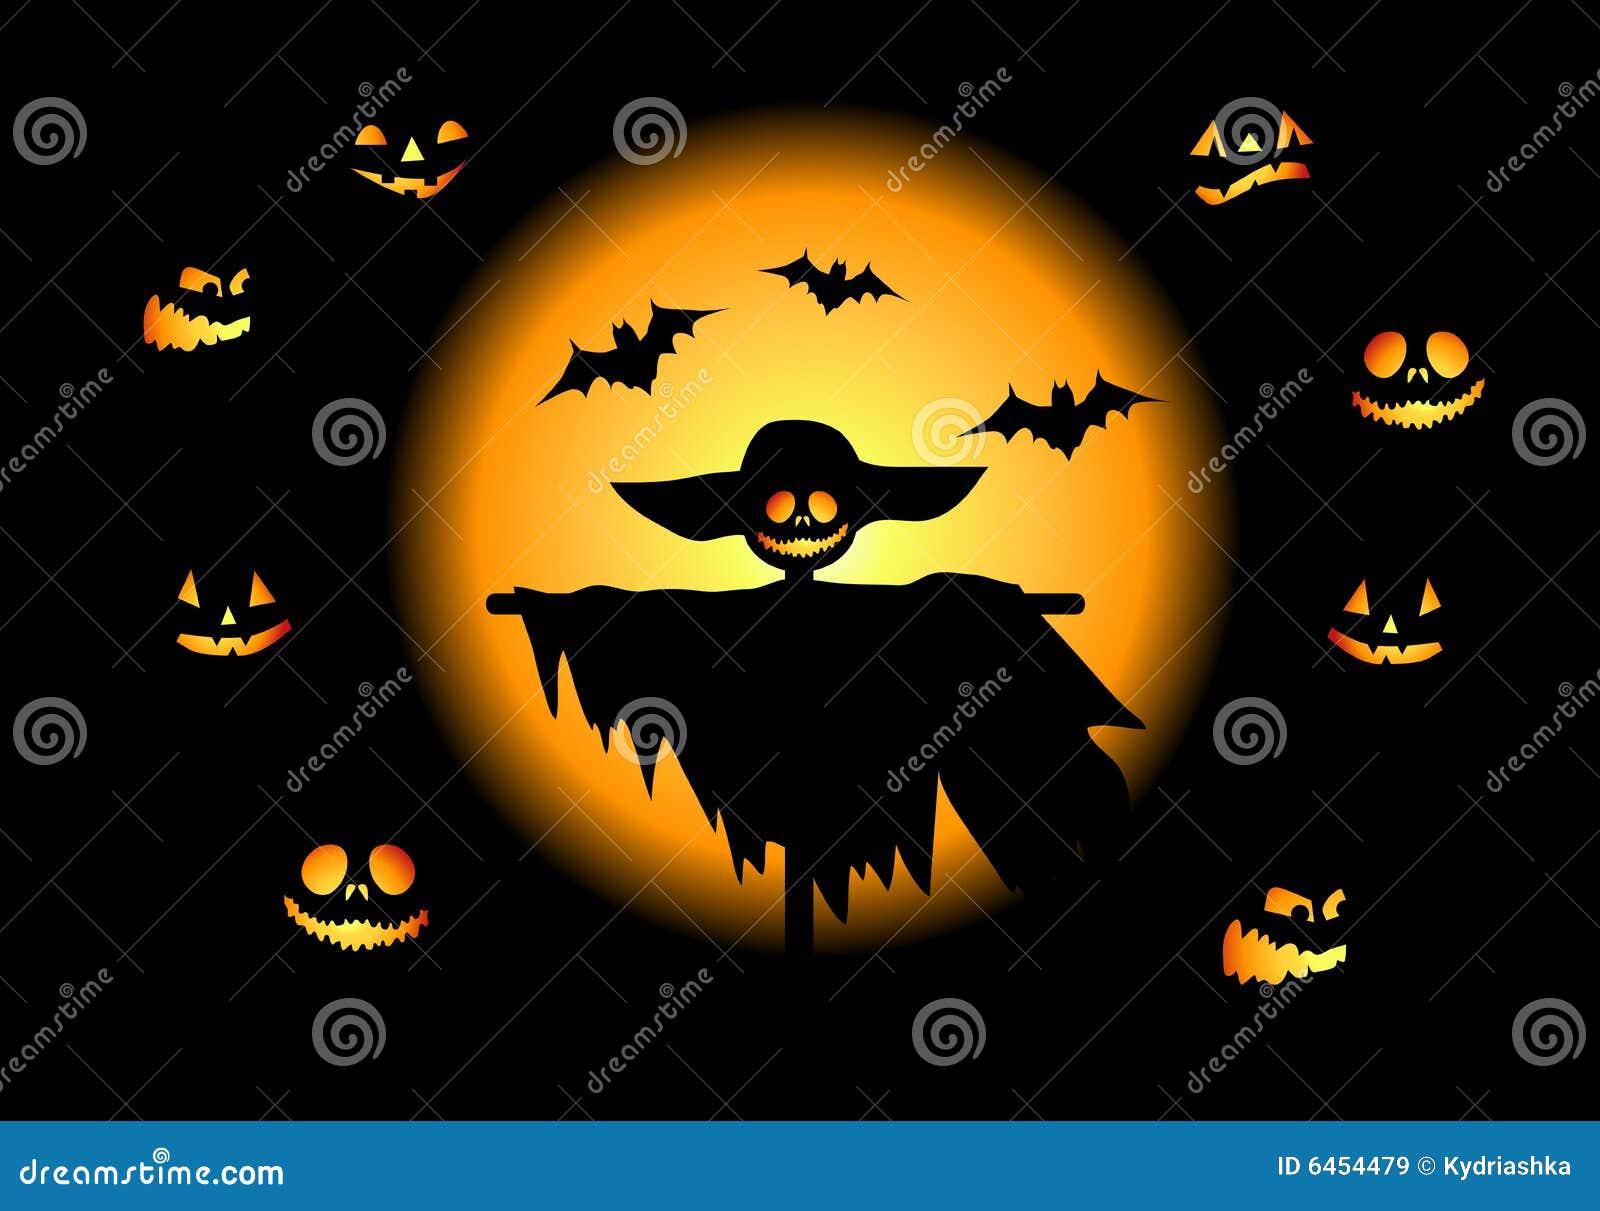 W noc Halloween.